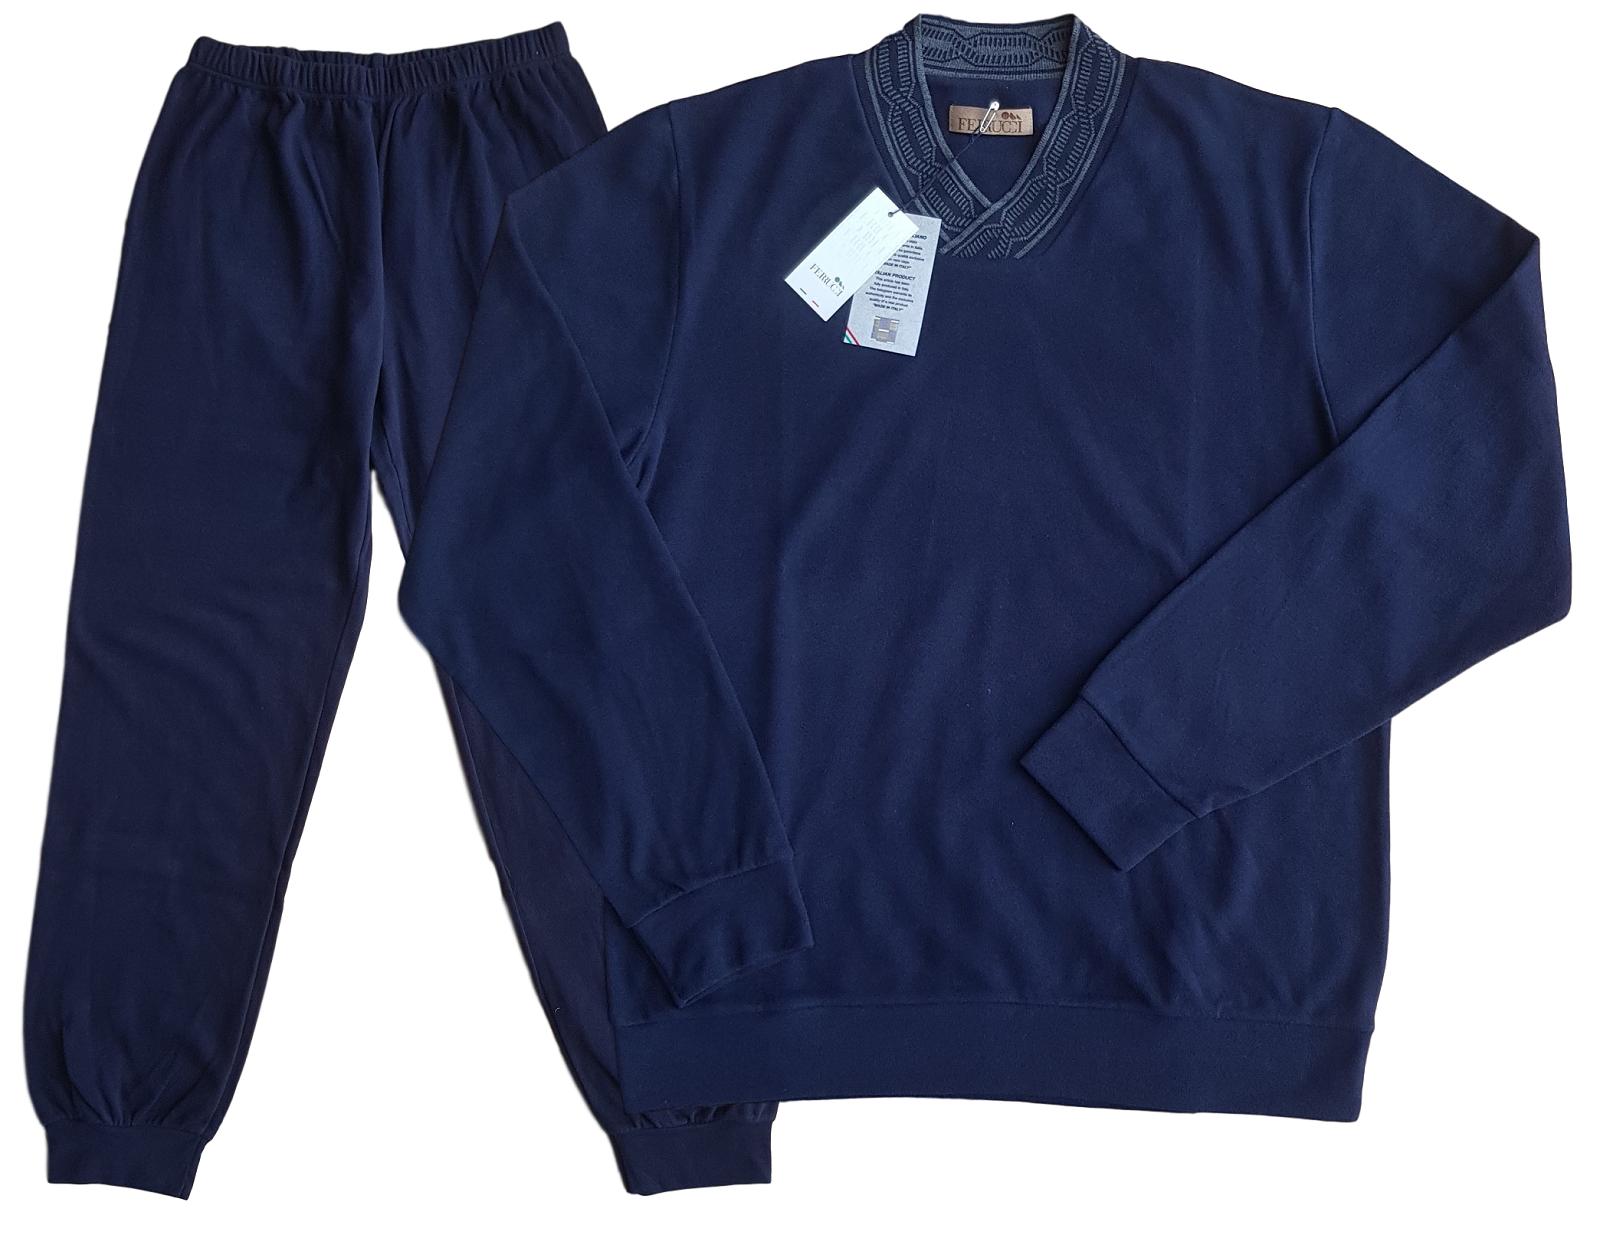 FERRUCCI. Herren Pyjamas Winter aus Microfleece. Mod. Hals V. 2619 Haken Sie